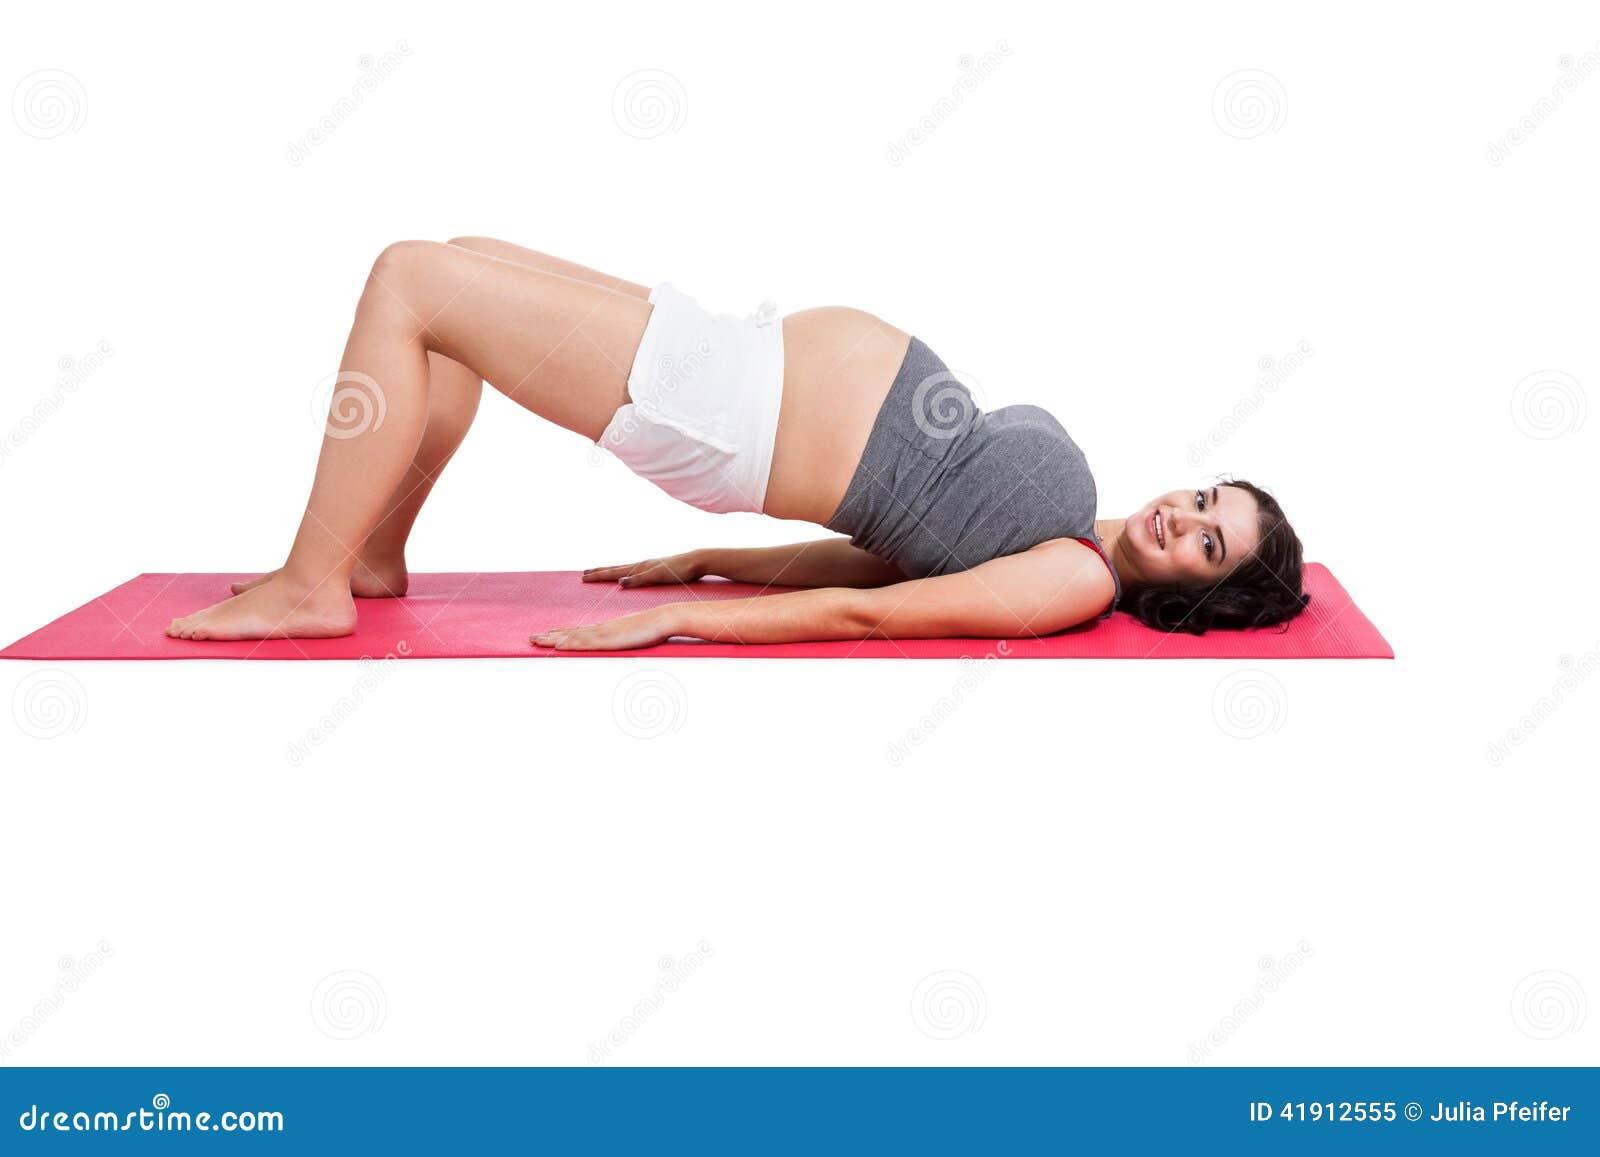 Aerobics For Pregnant Women 93